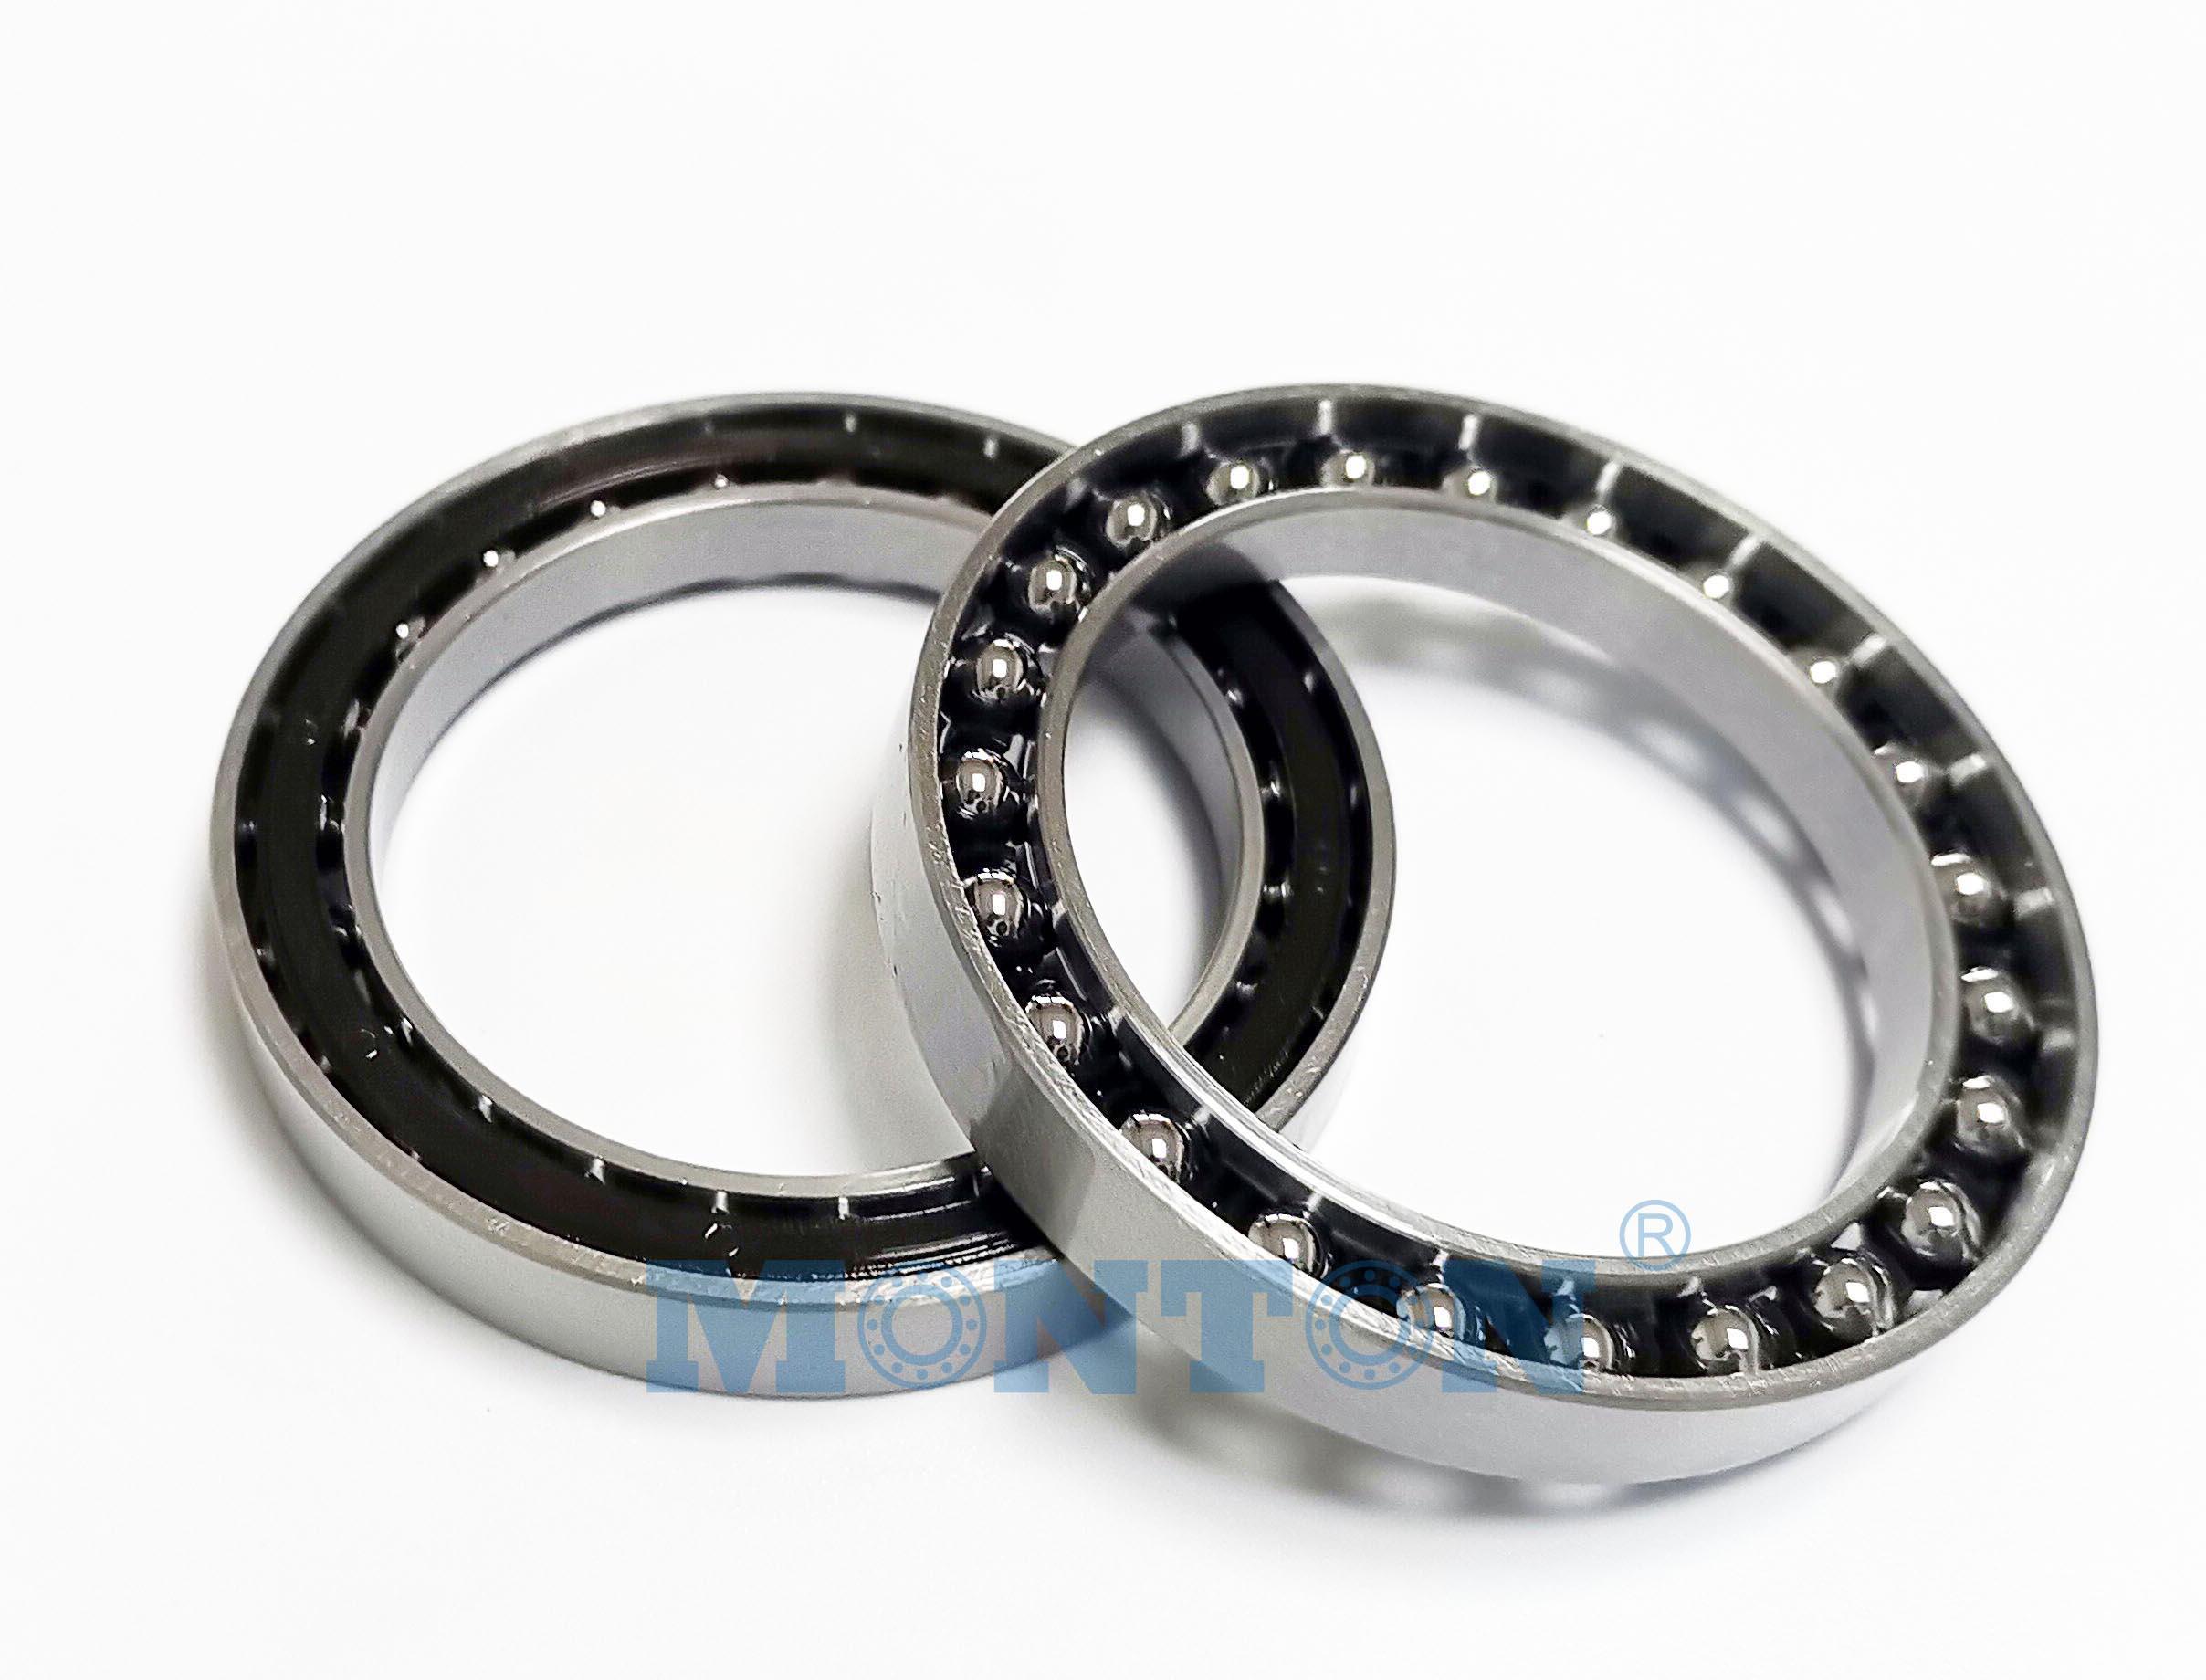 F25 45.212*61.341*9.015mm flexible bearing for harmonic drive